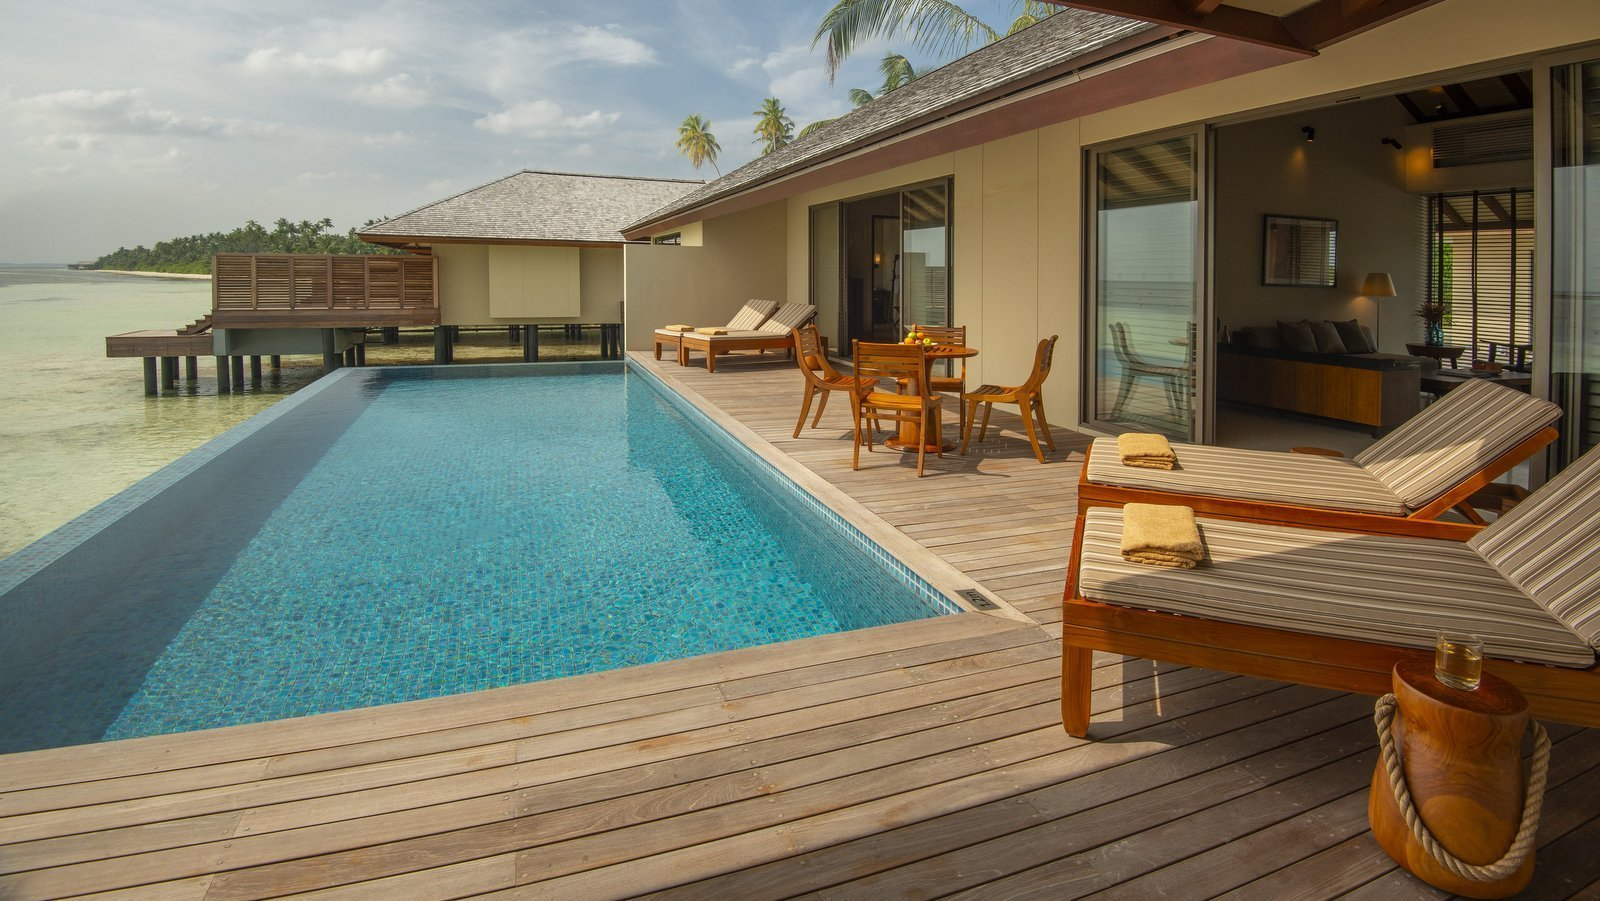 Мальдивы, отель The Residence Maldives at Dhigurah, номер Two-Bedroom Water Pool Villa